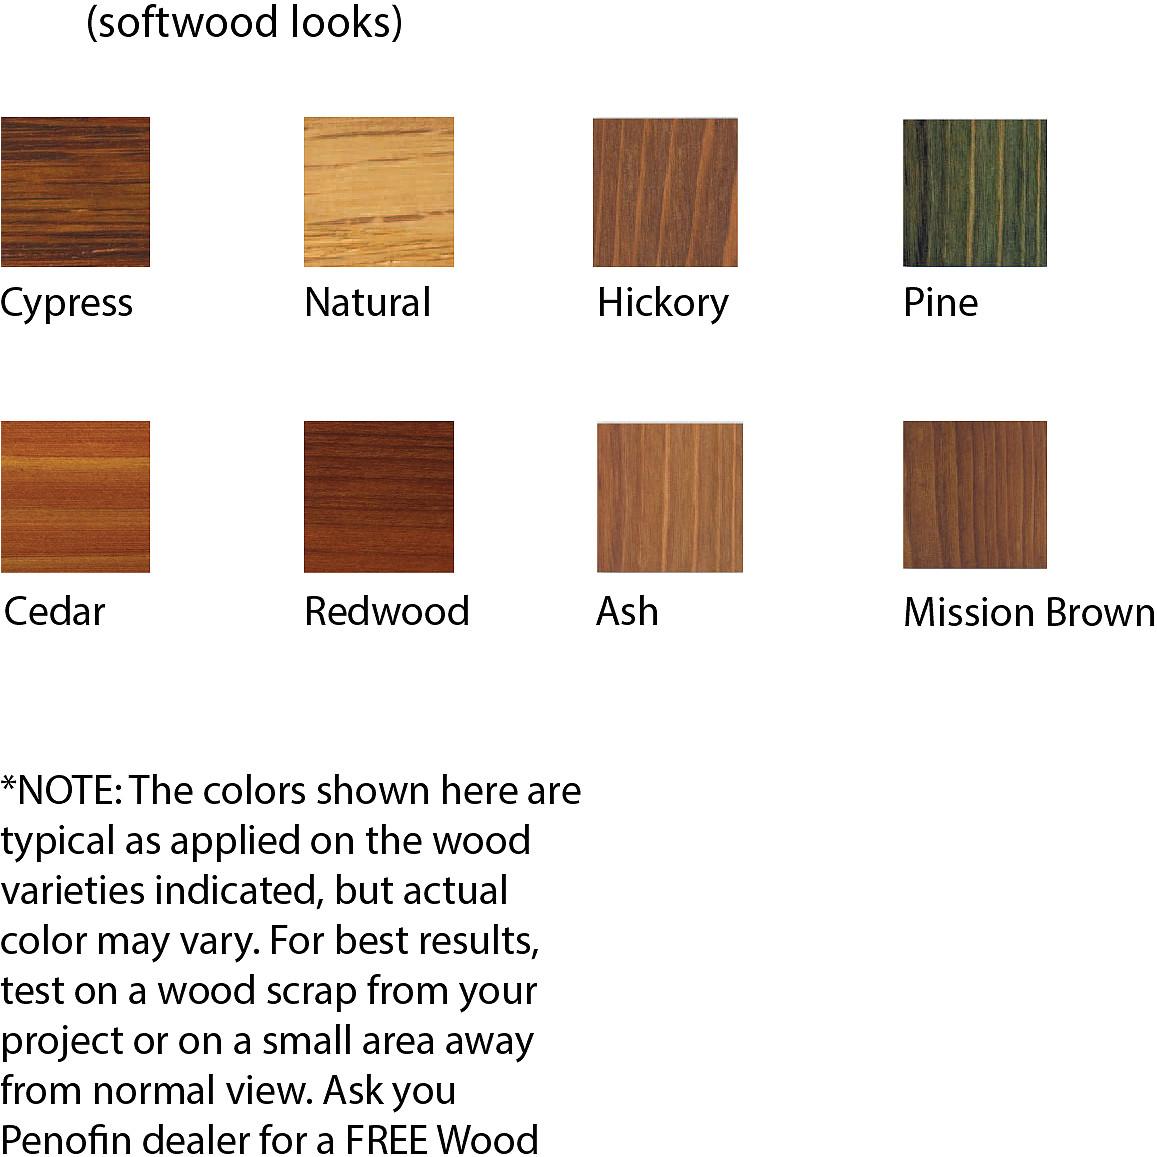 penofin verde softwood looks